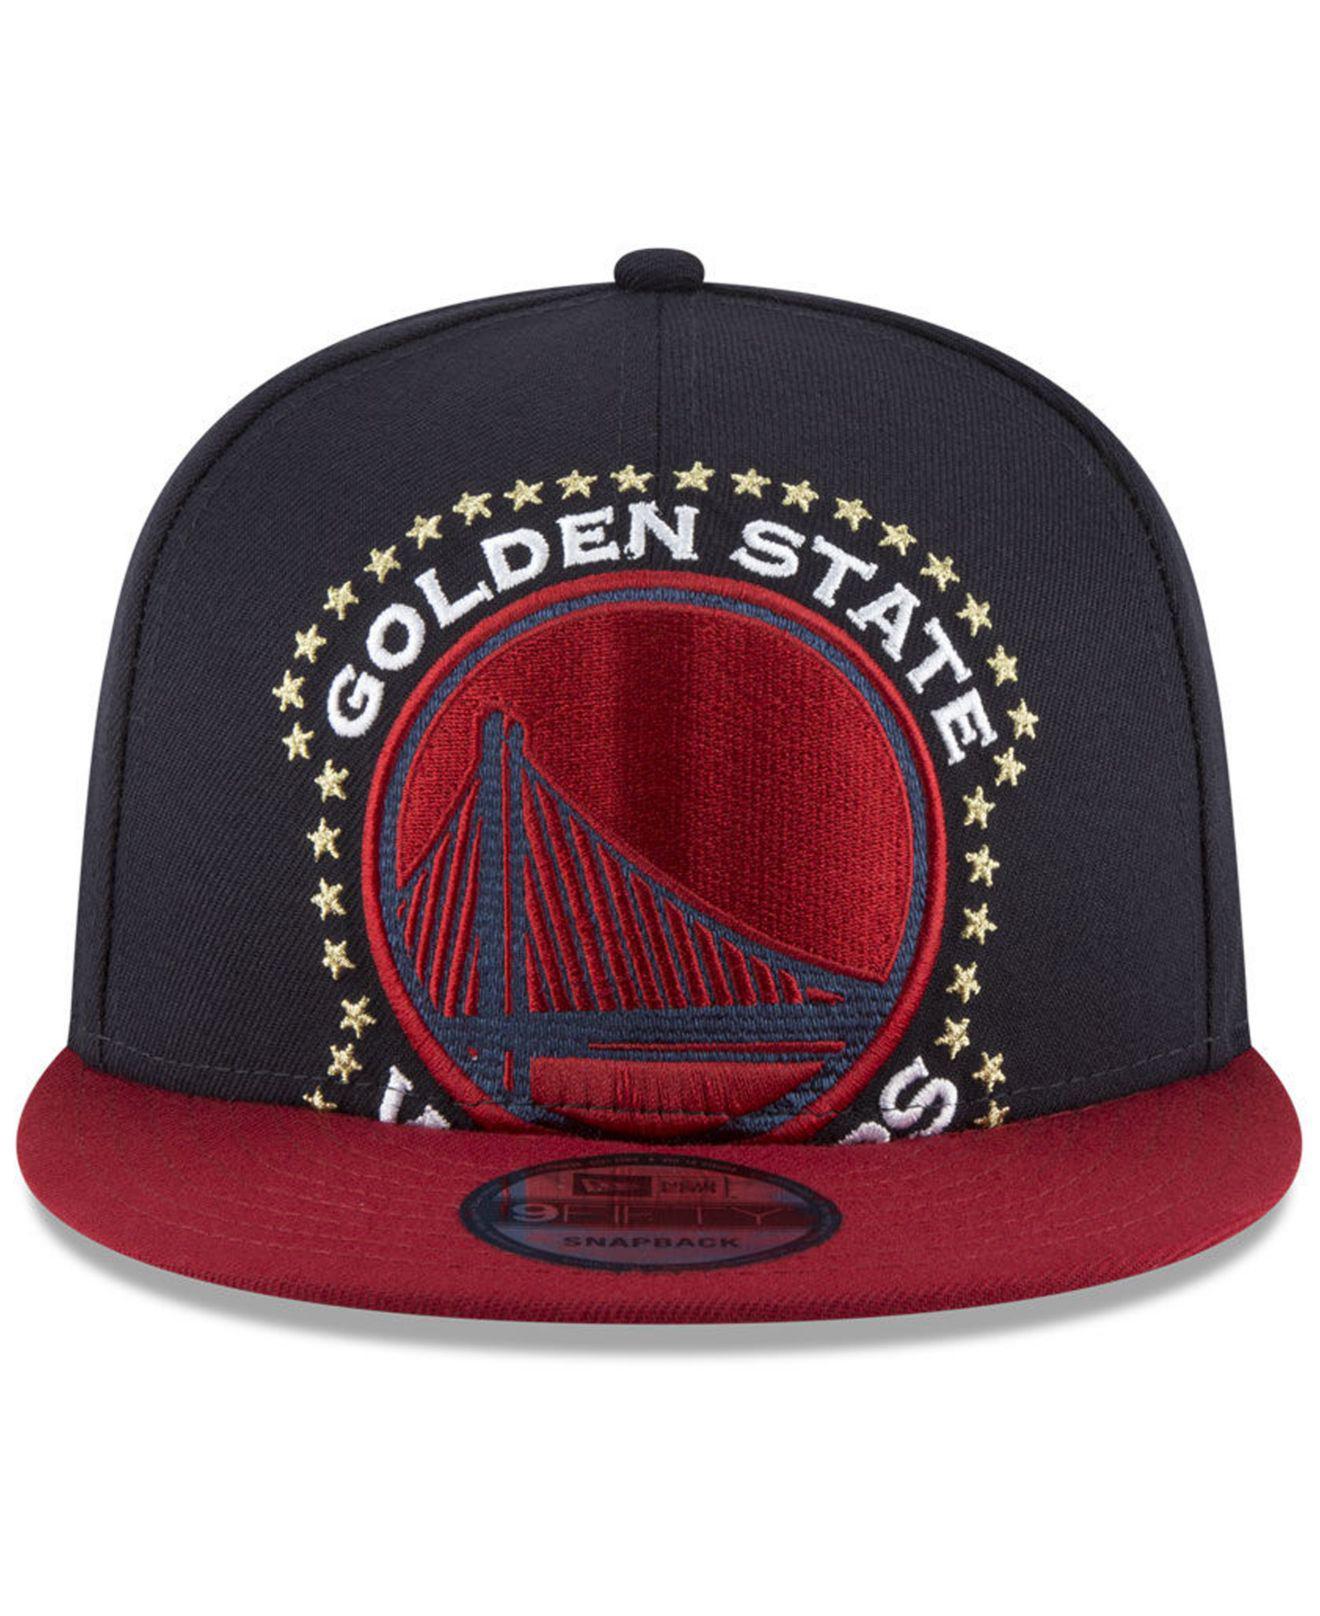 3836010d909 ... order lyst ktz golden state warriors xl americana 9fifty snapback cap  in blue for men 2e2aa